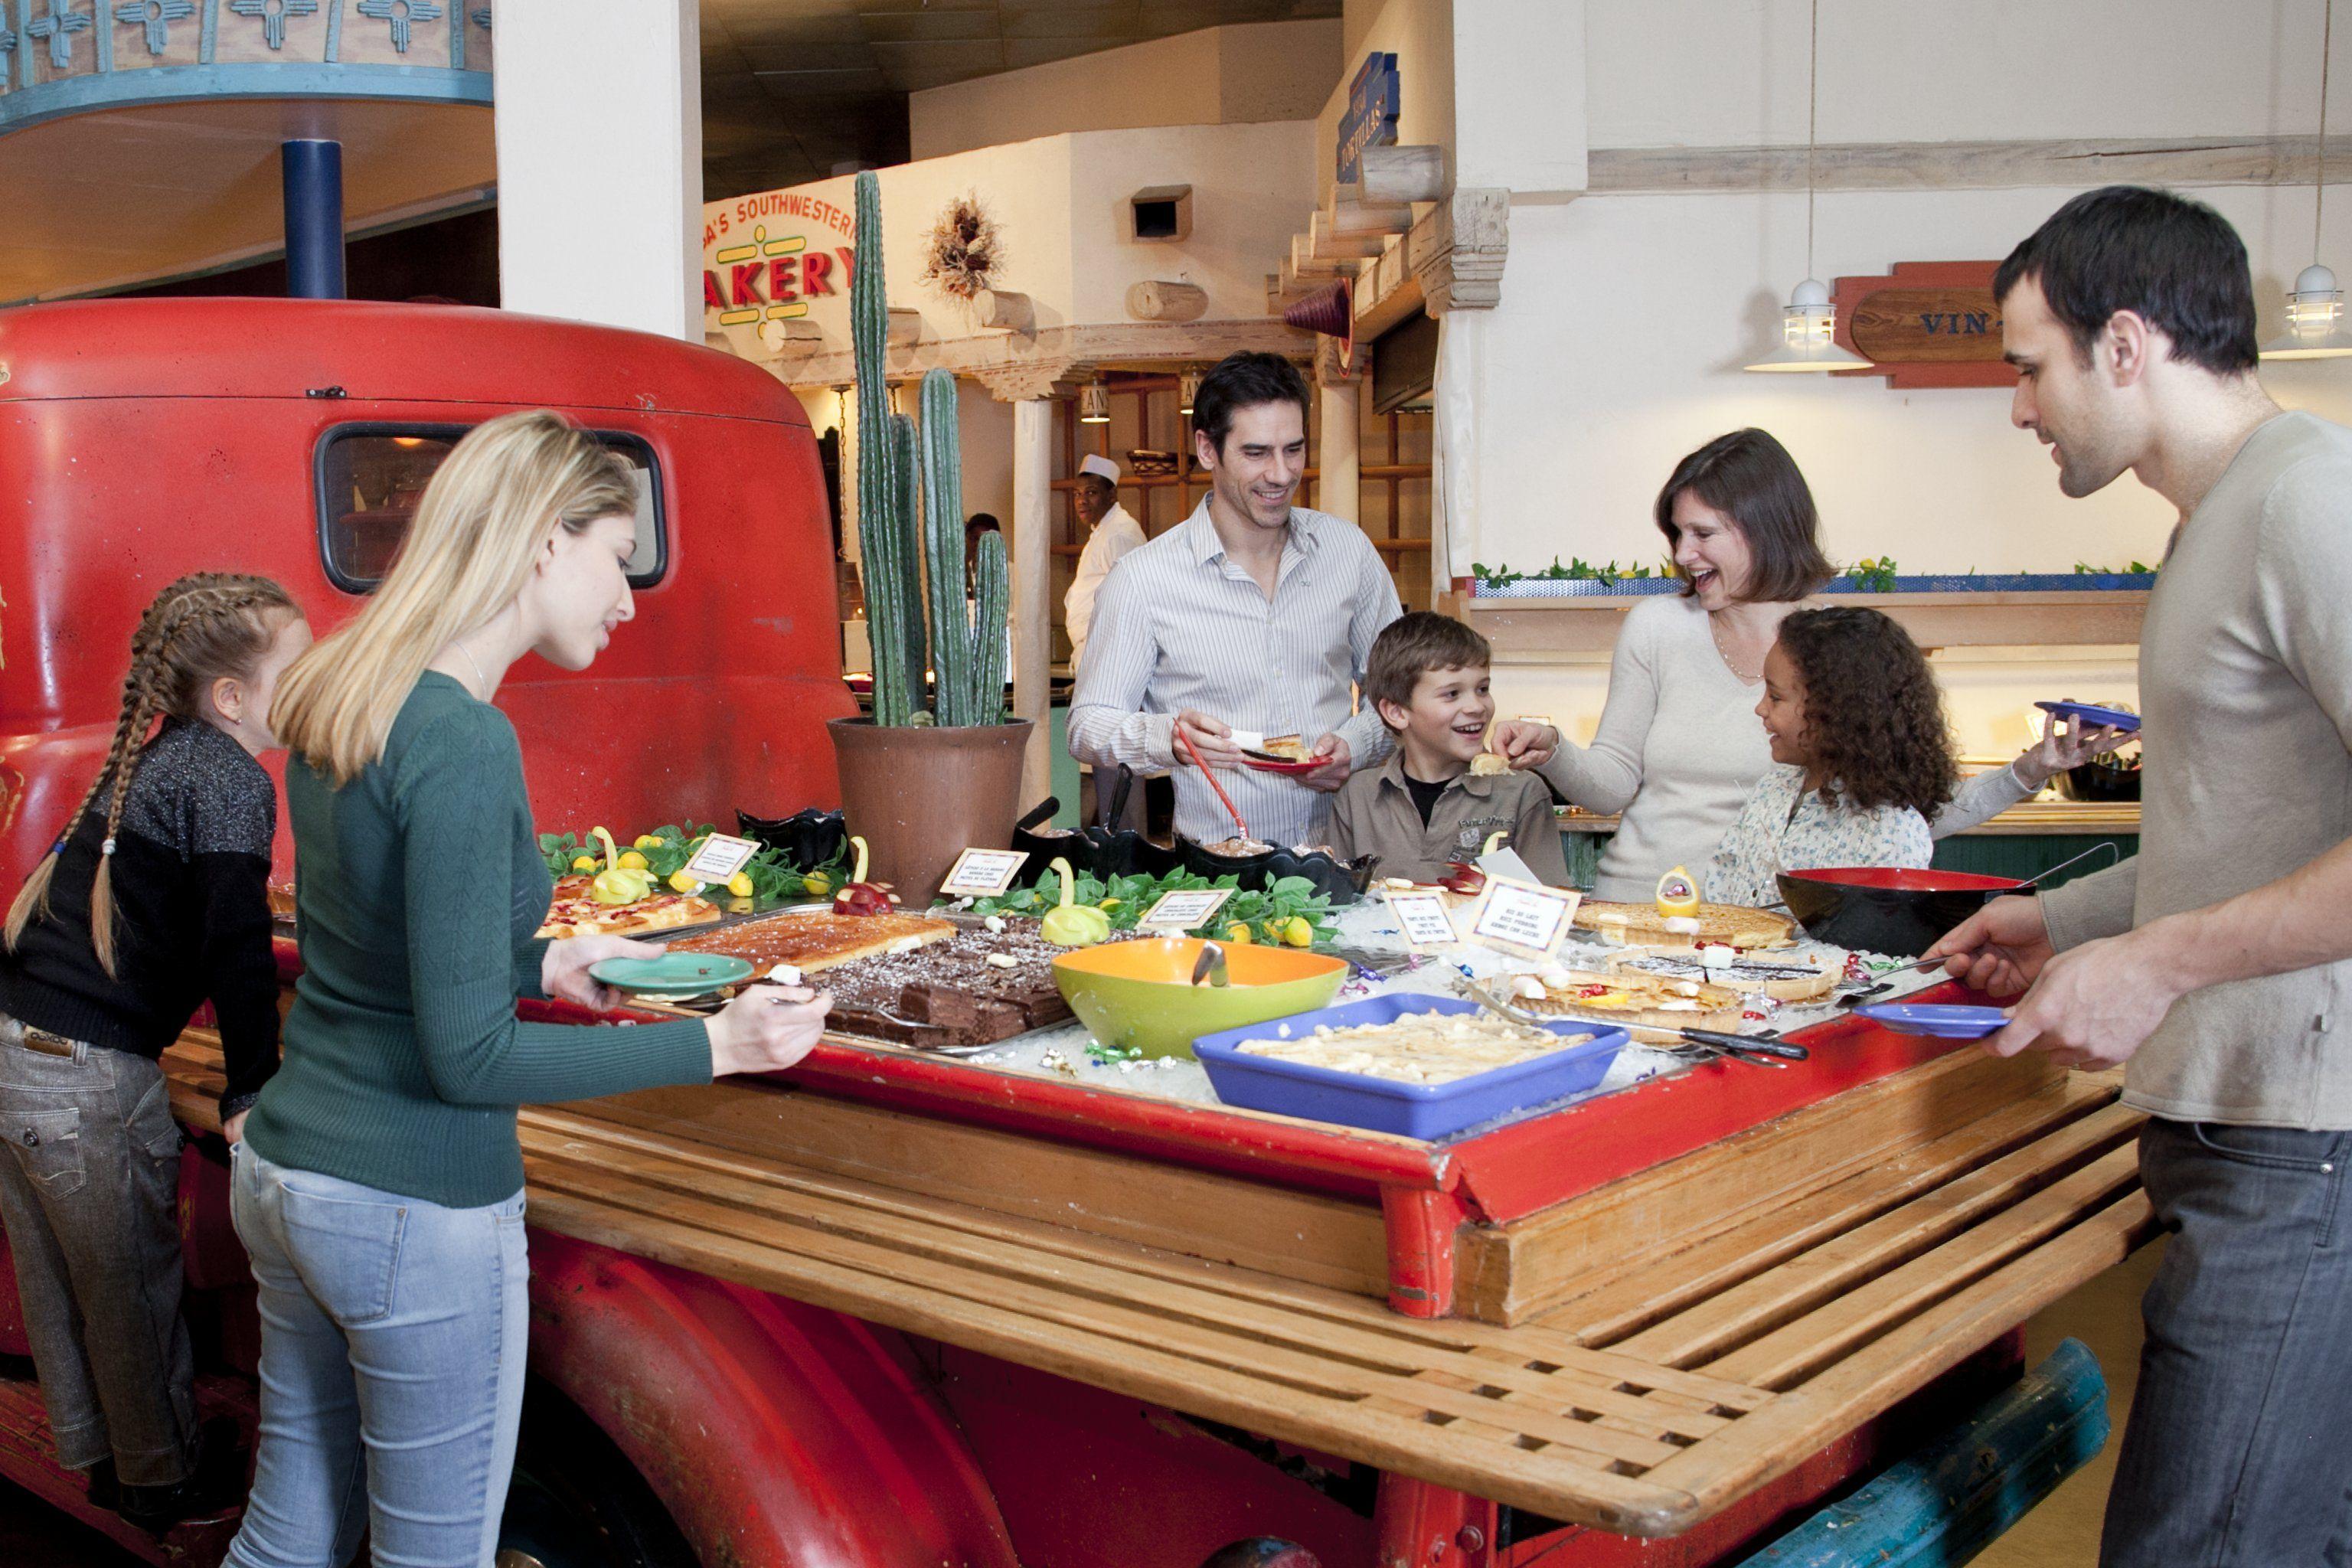 disney hotels santa fe family at la cantina buffet disneyland paris disney 39 s hotel santa. Black Bedroom Furniture Sets. Home Design Ideas